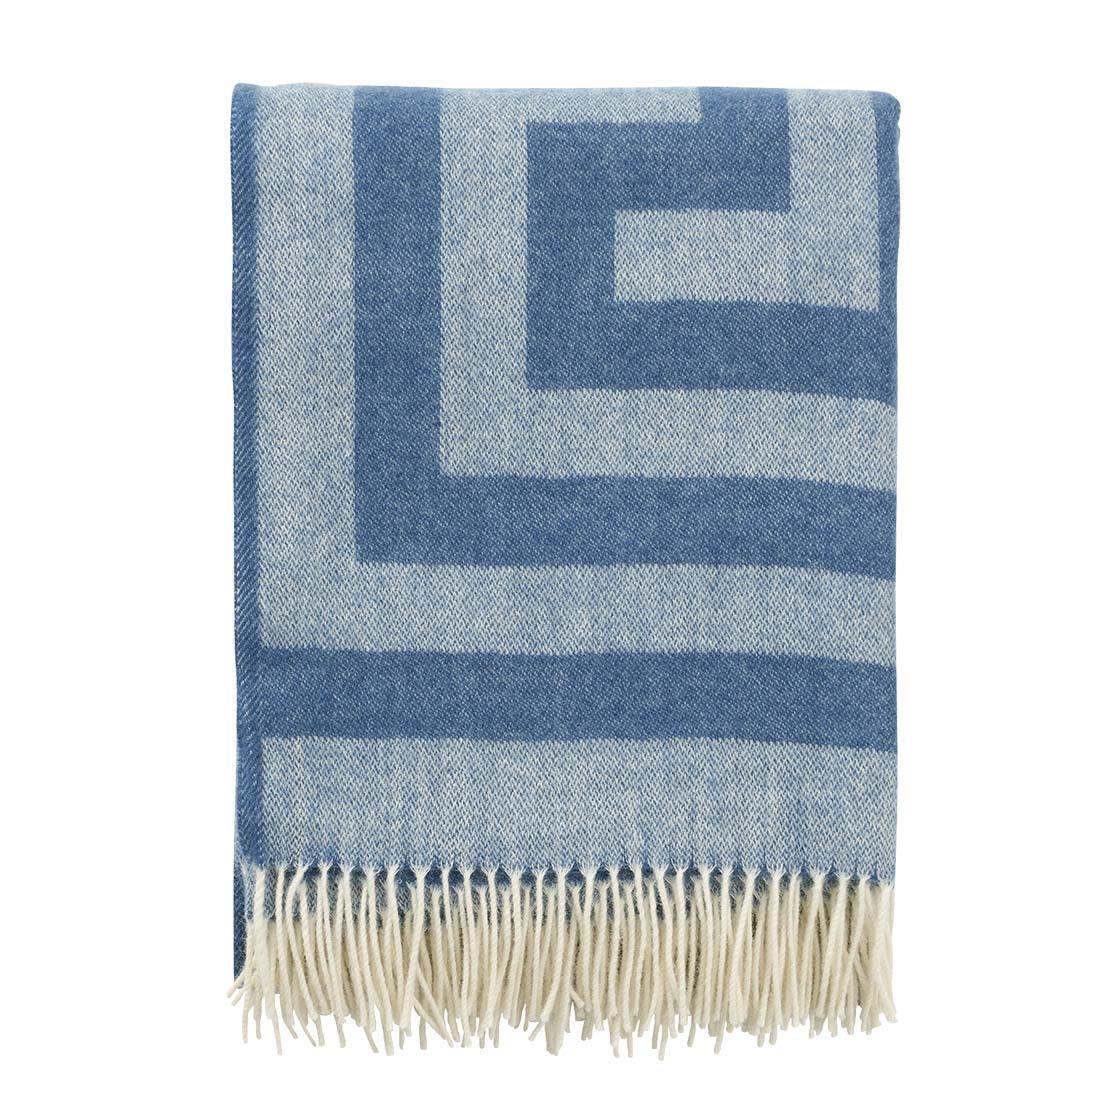 Ullpläd premium Memphis blå Klippan Yllefabrik